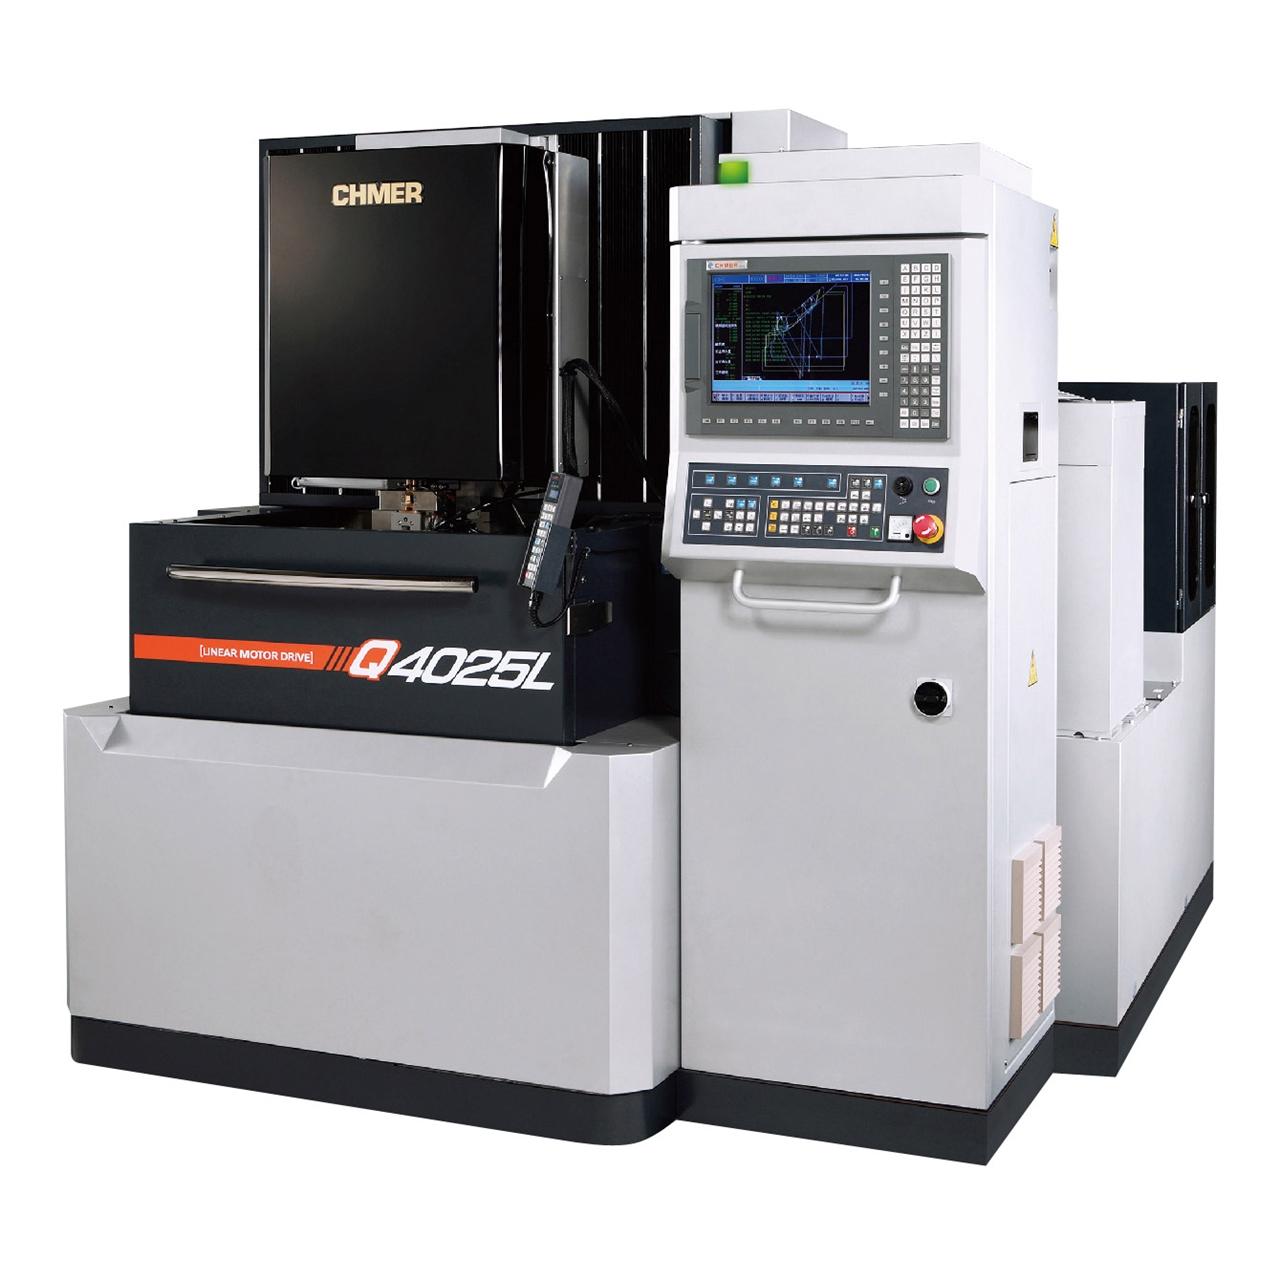 EDM Network   Wire Cut EDMs   Chmer Q4025L High Precision Linear Drive